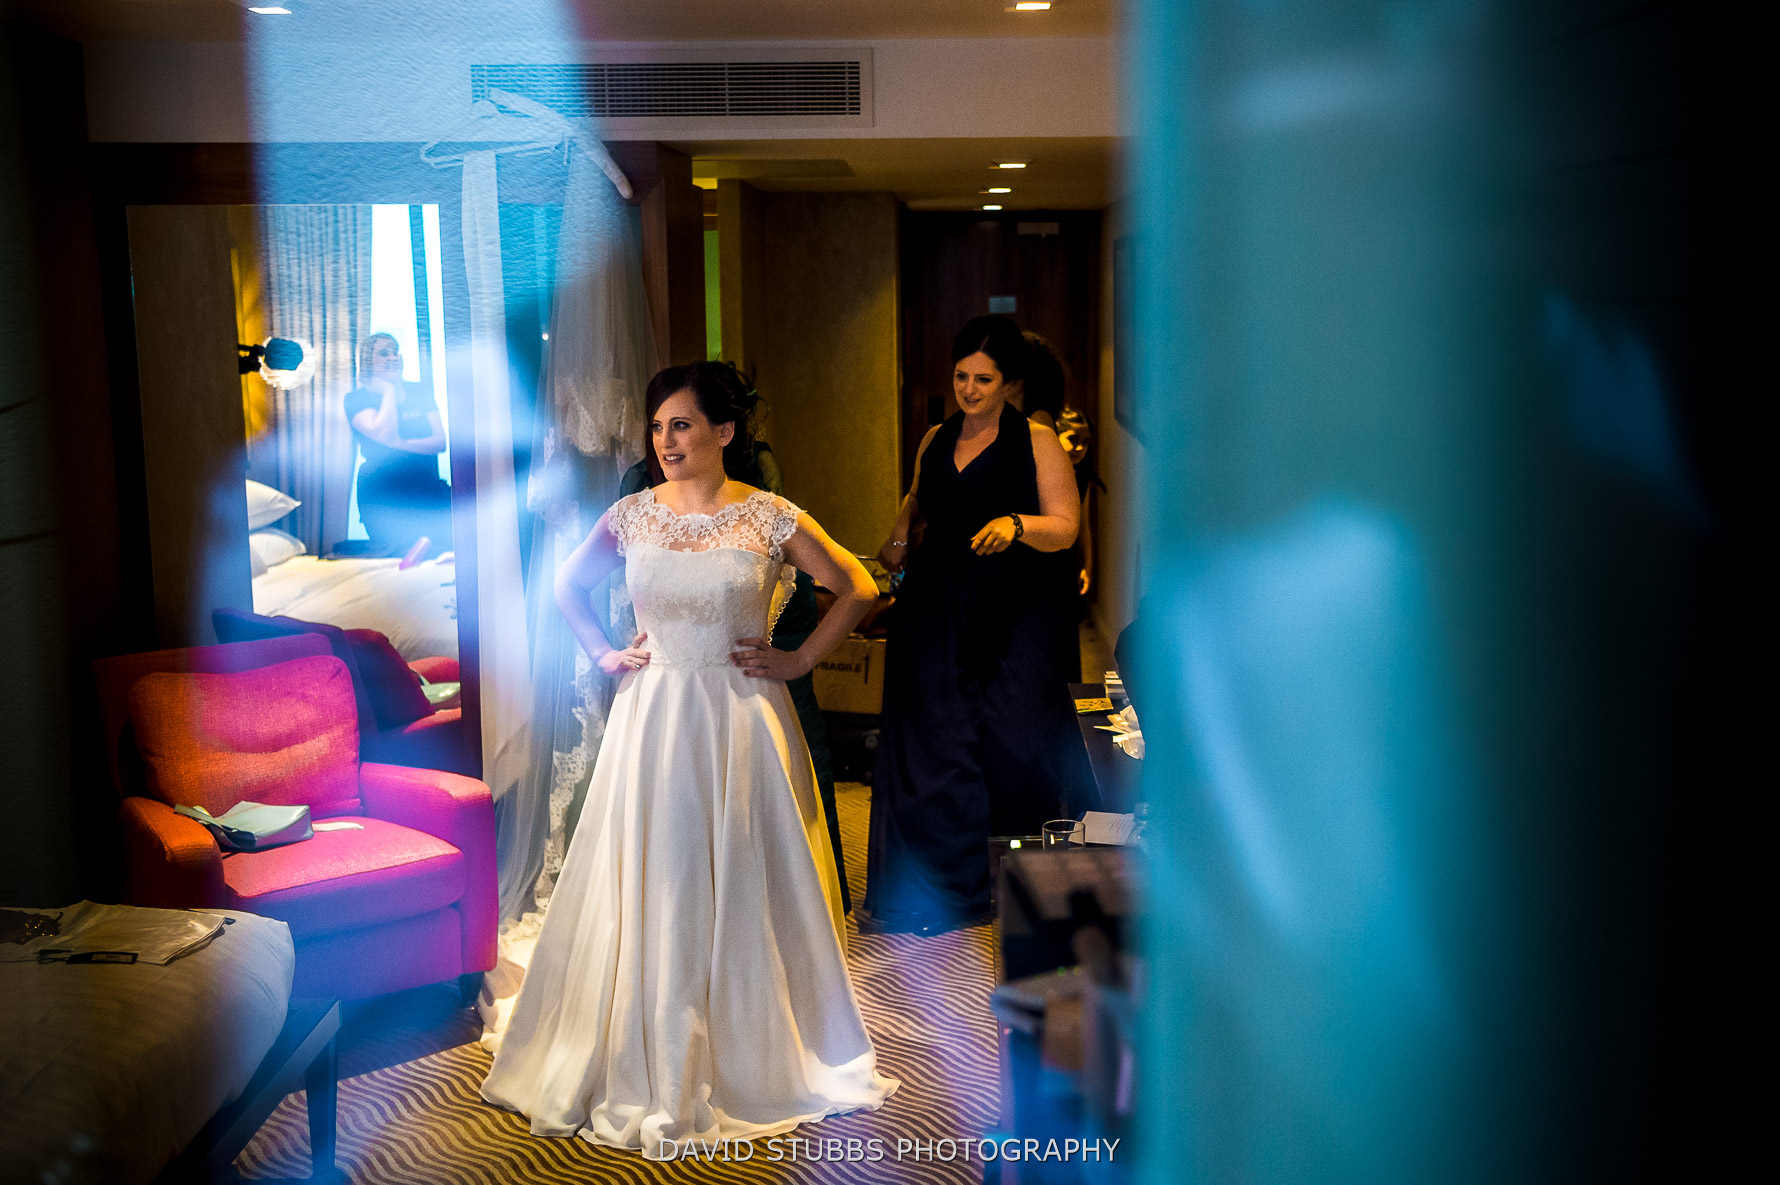 bride in wedding dress through glass